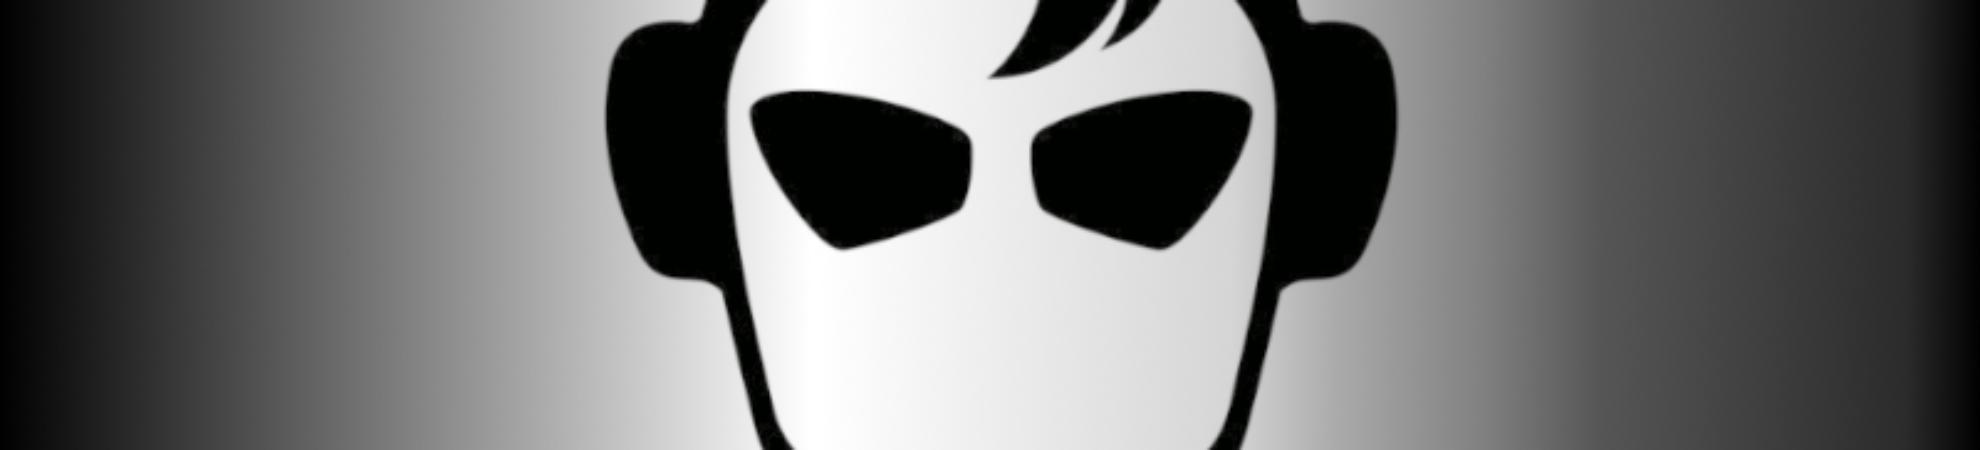 Logo Sportrick